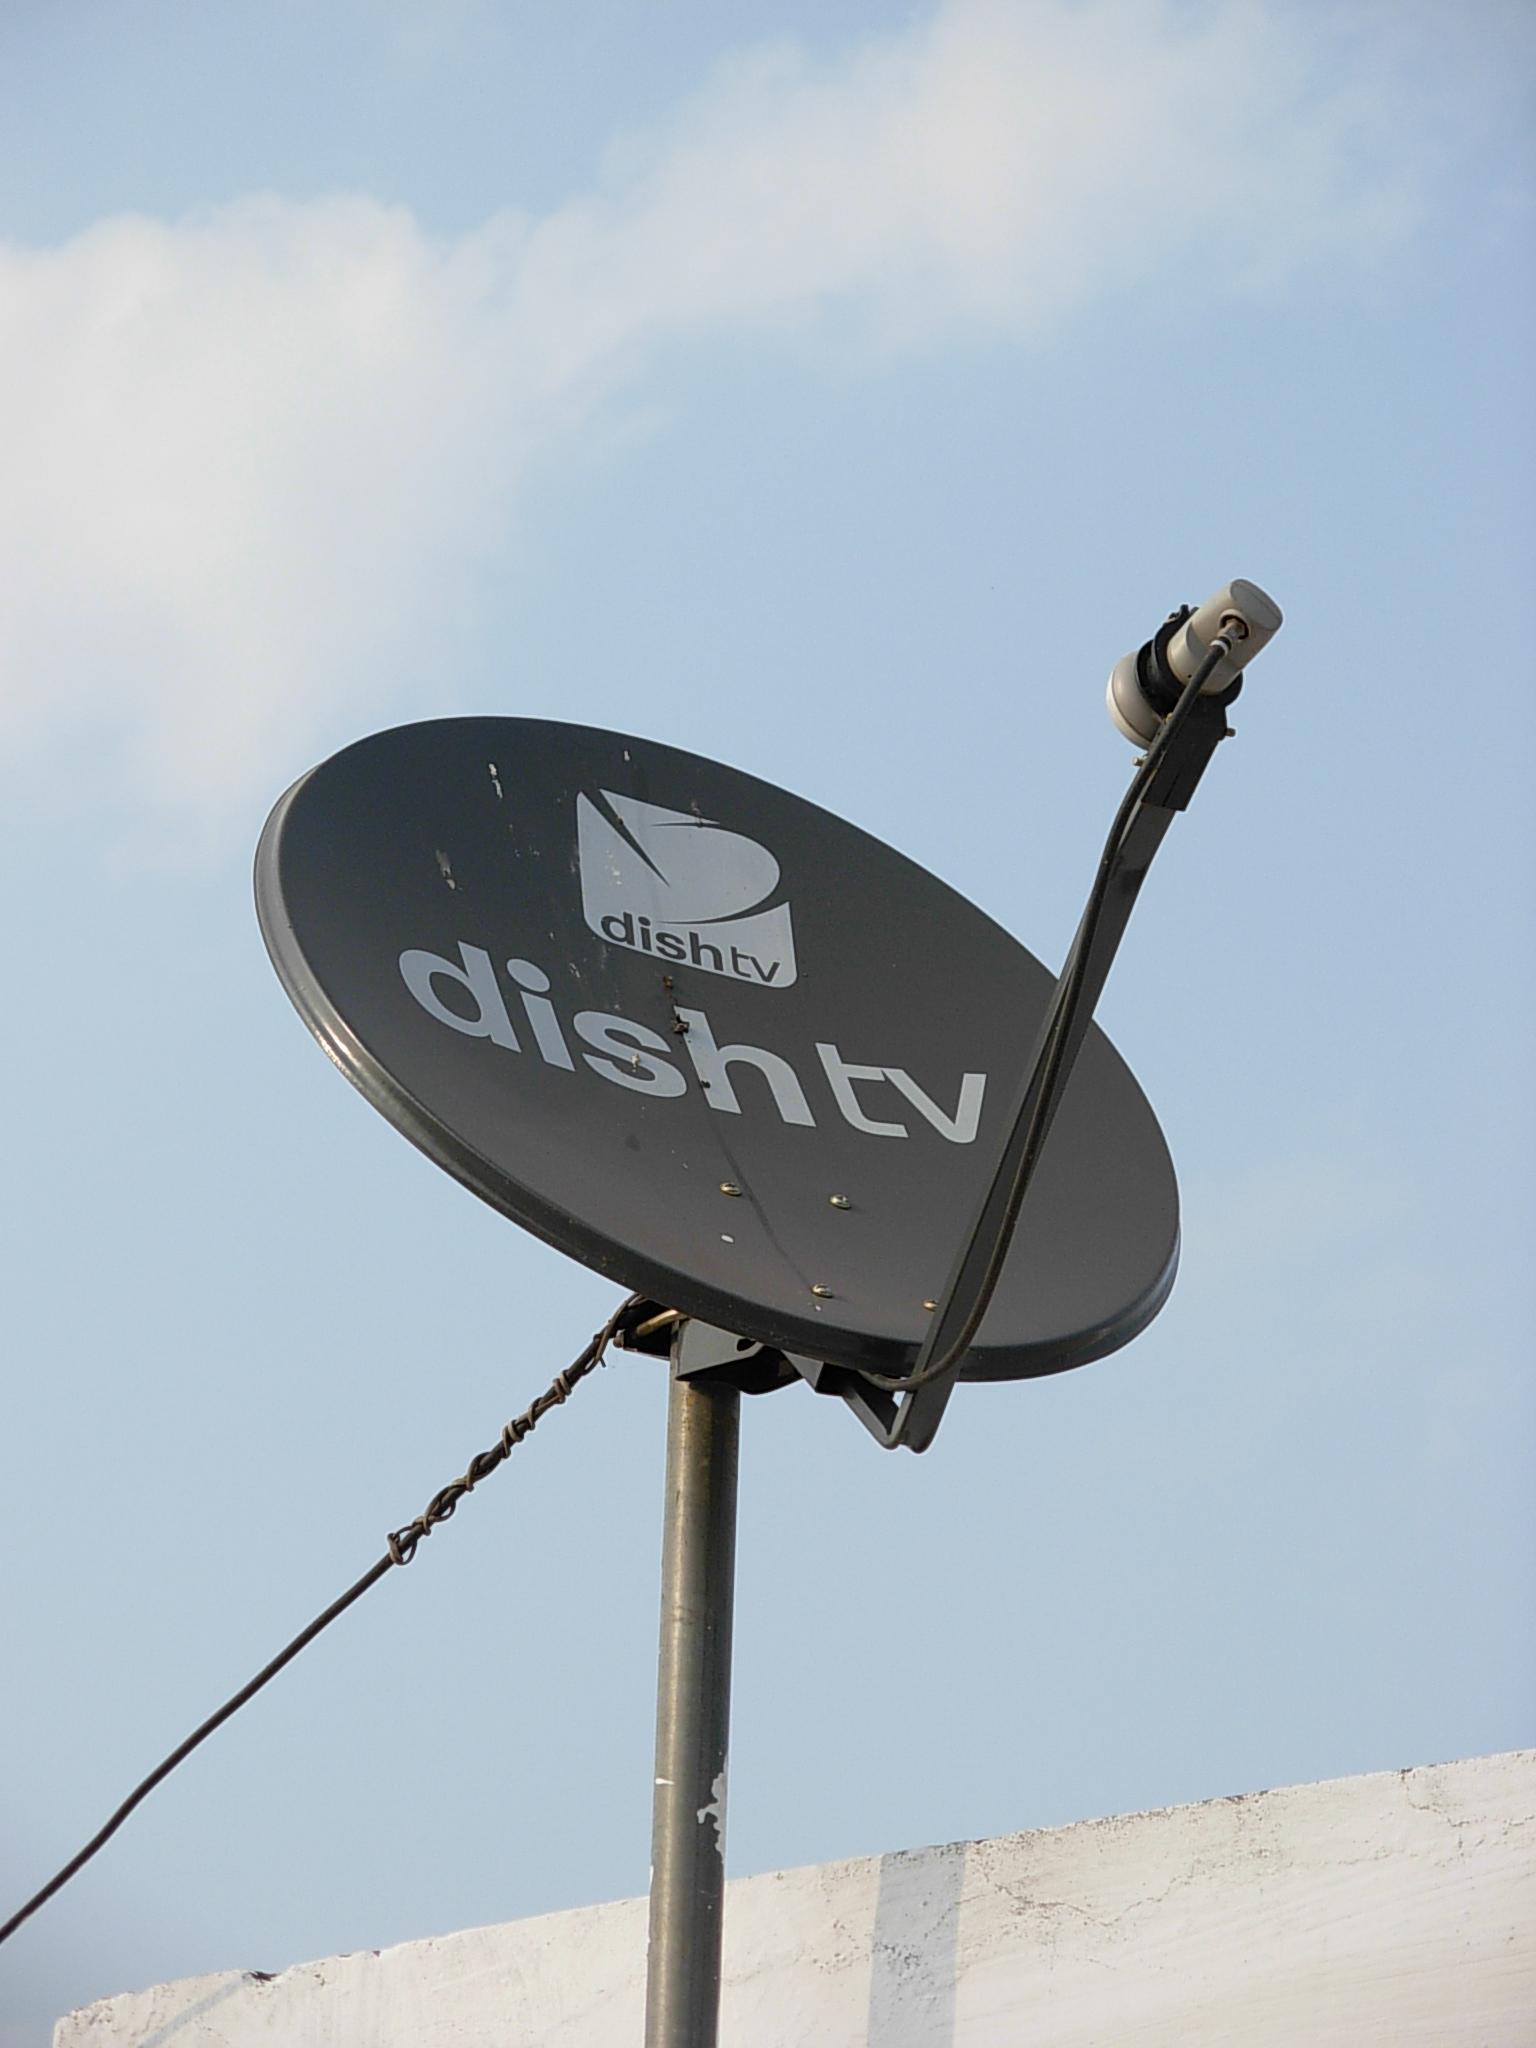 Dish Direct Tv Cayman Islands